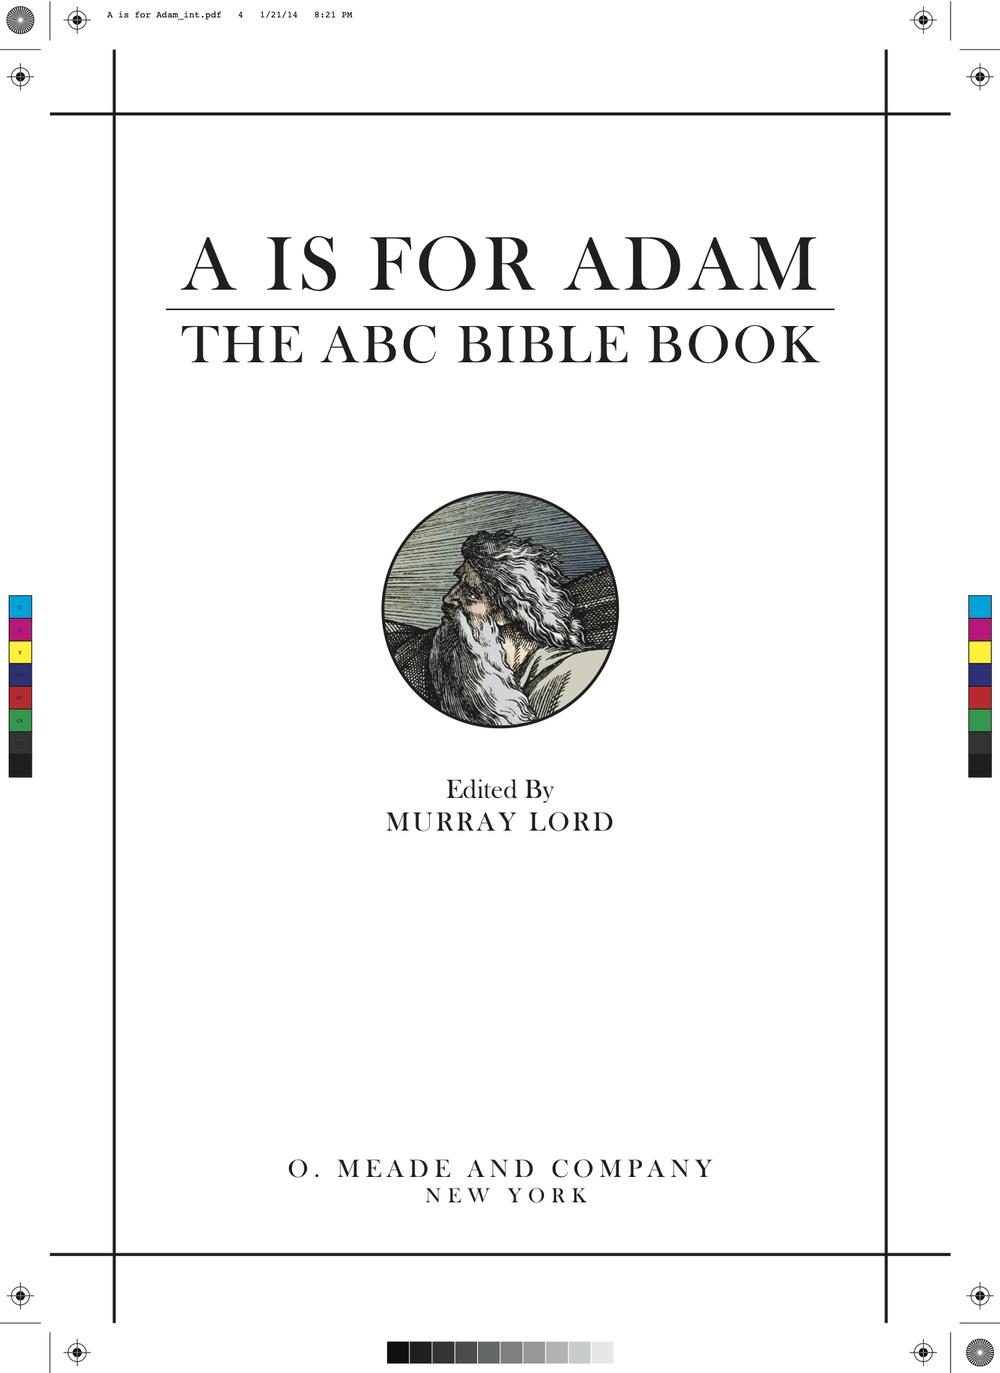 A for Adam exc 2.jpg